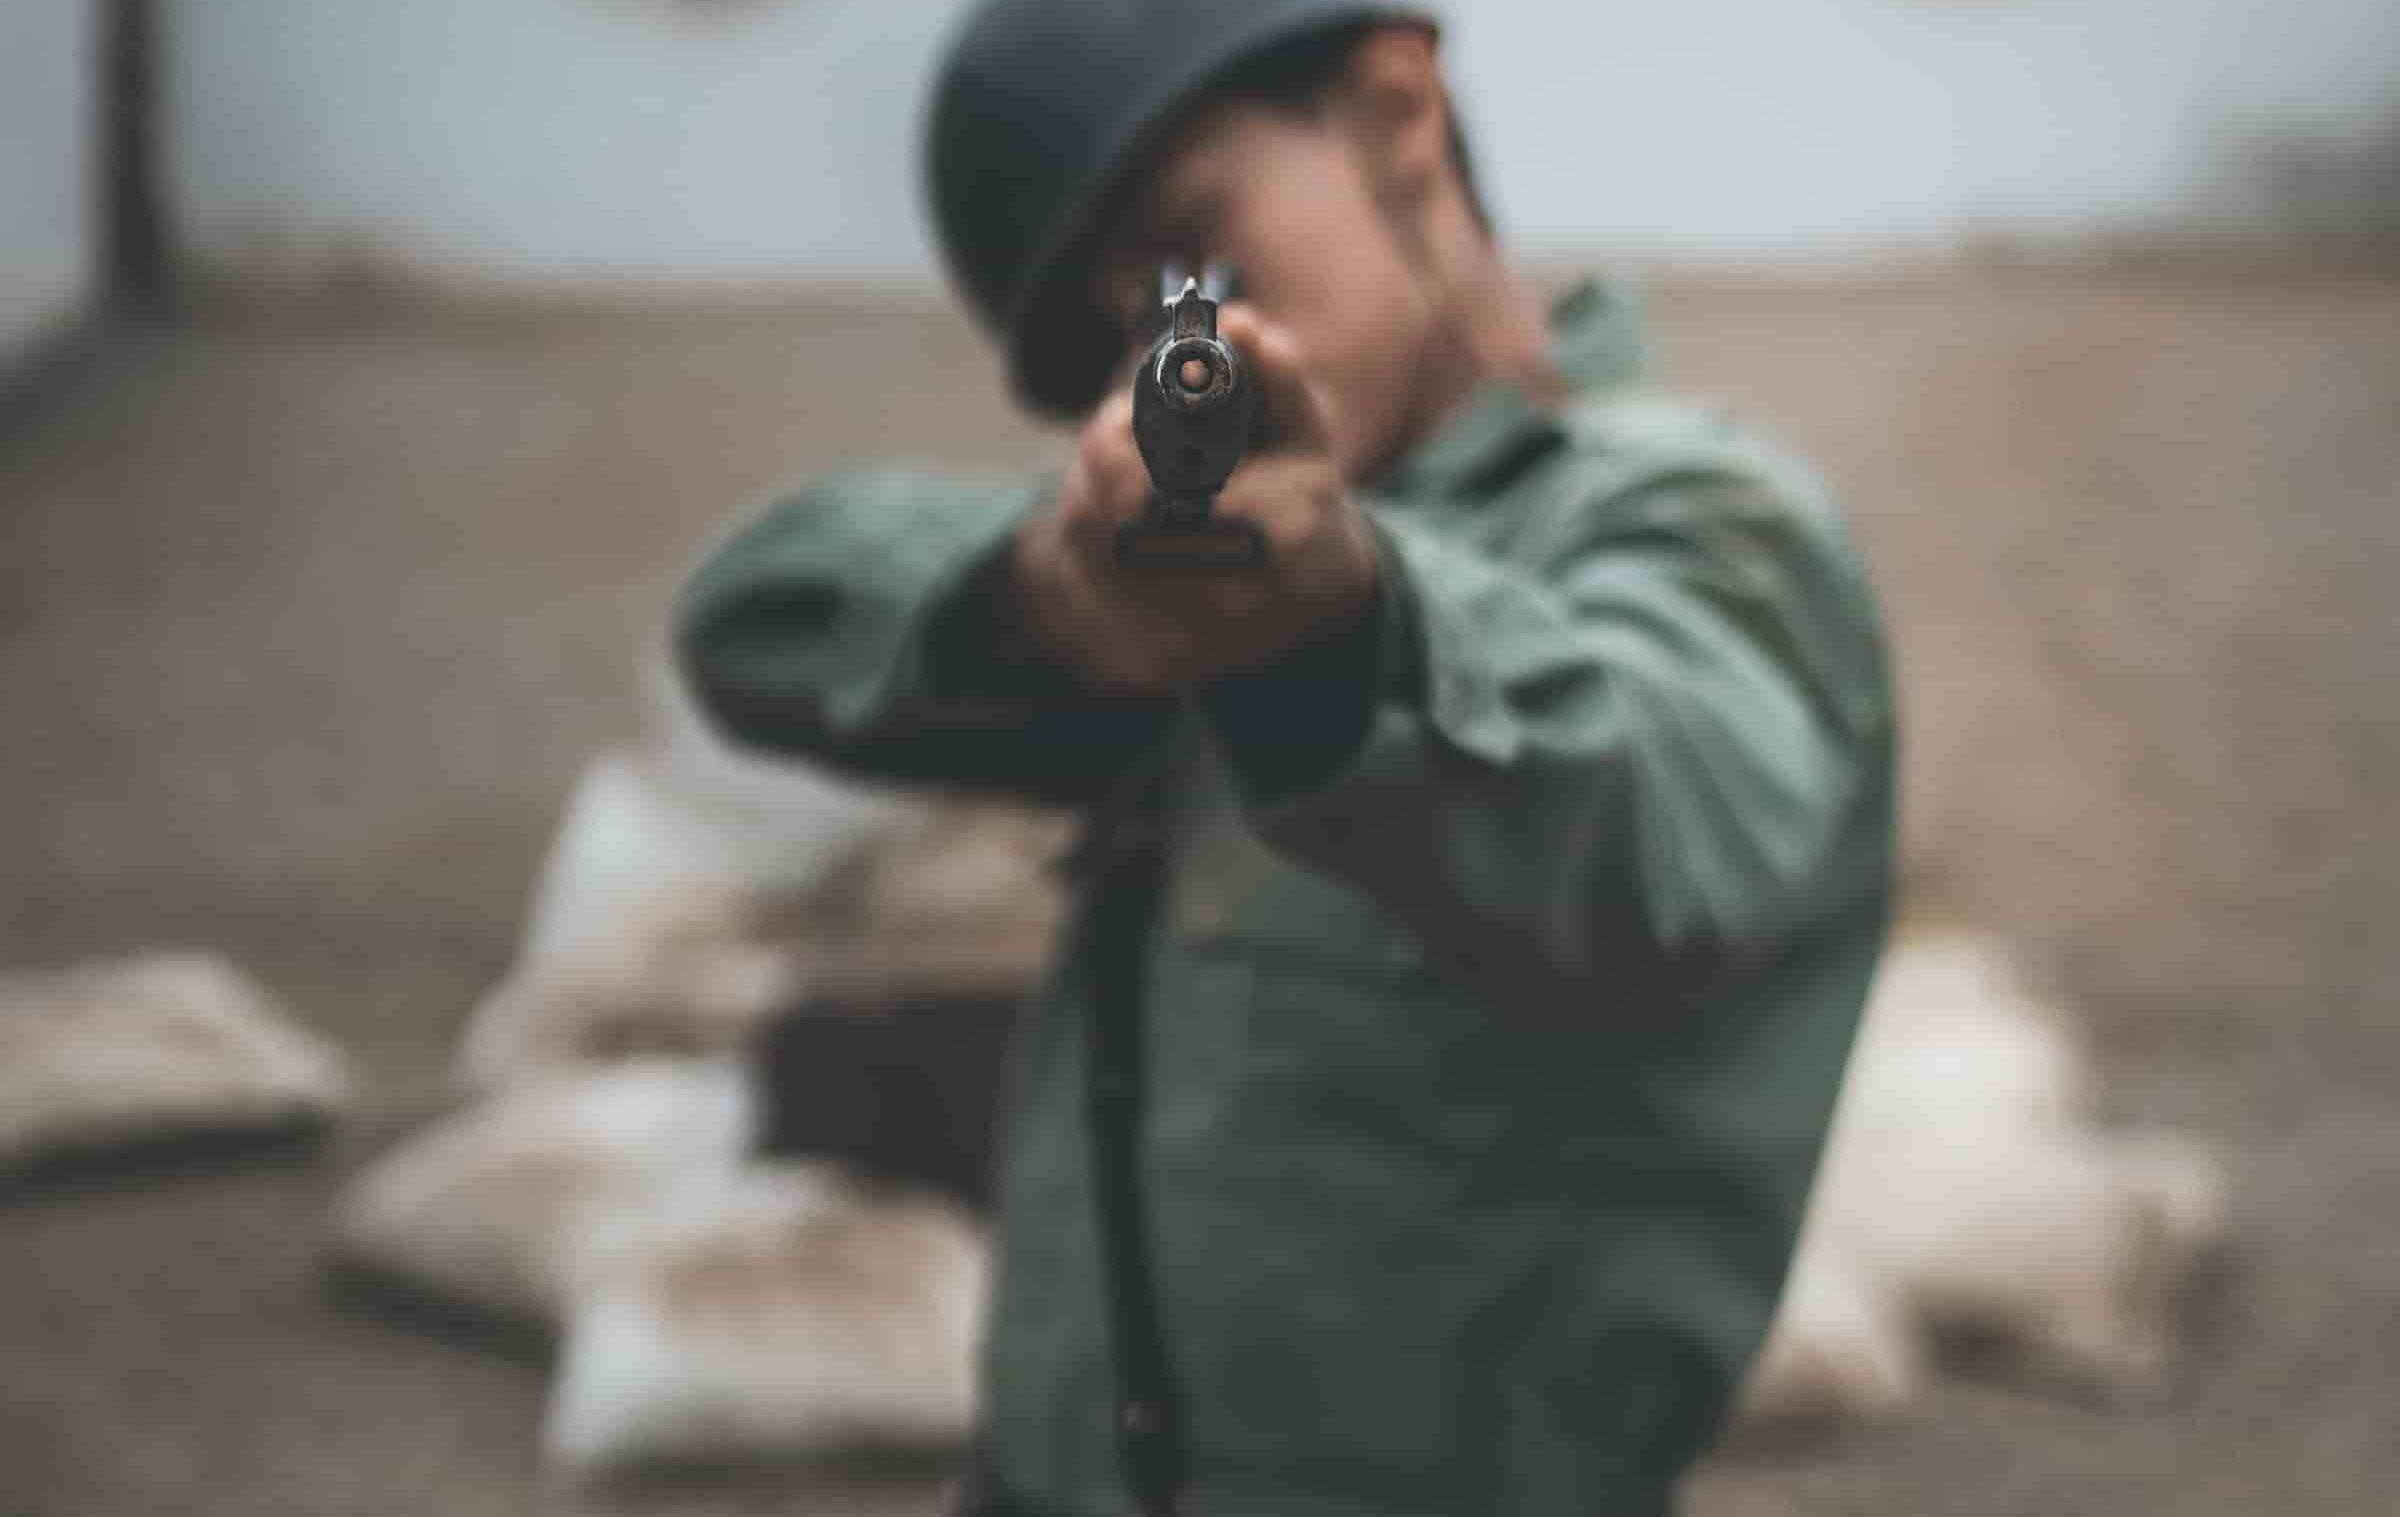 A man directly pointing his gun at the camera.